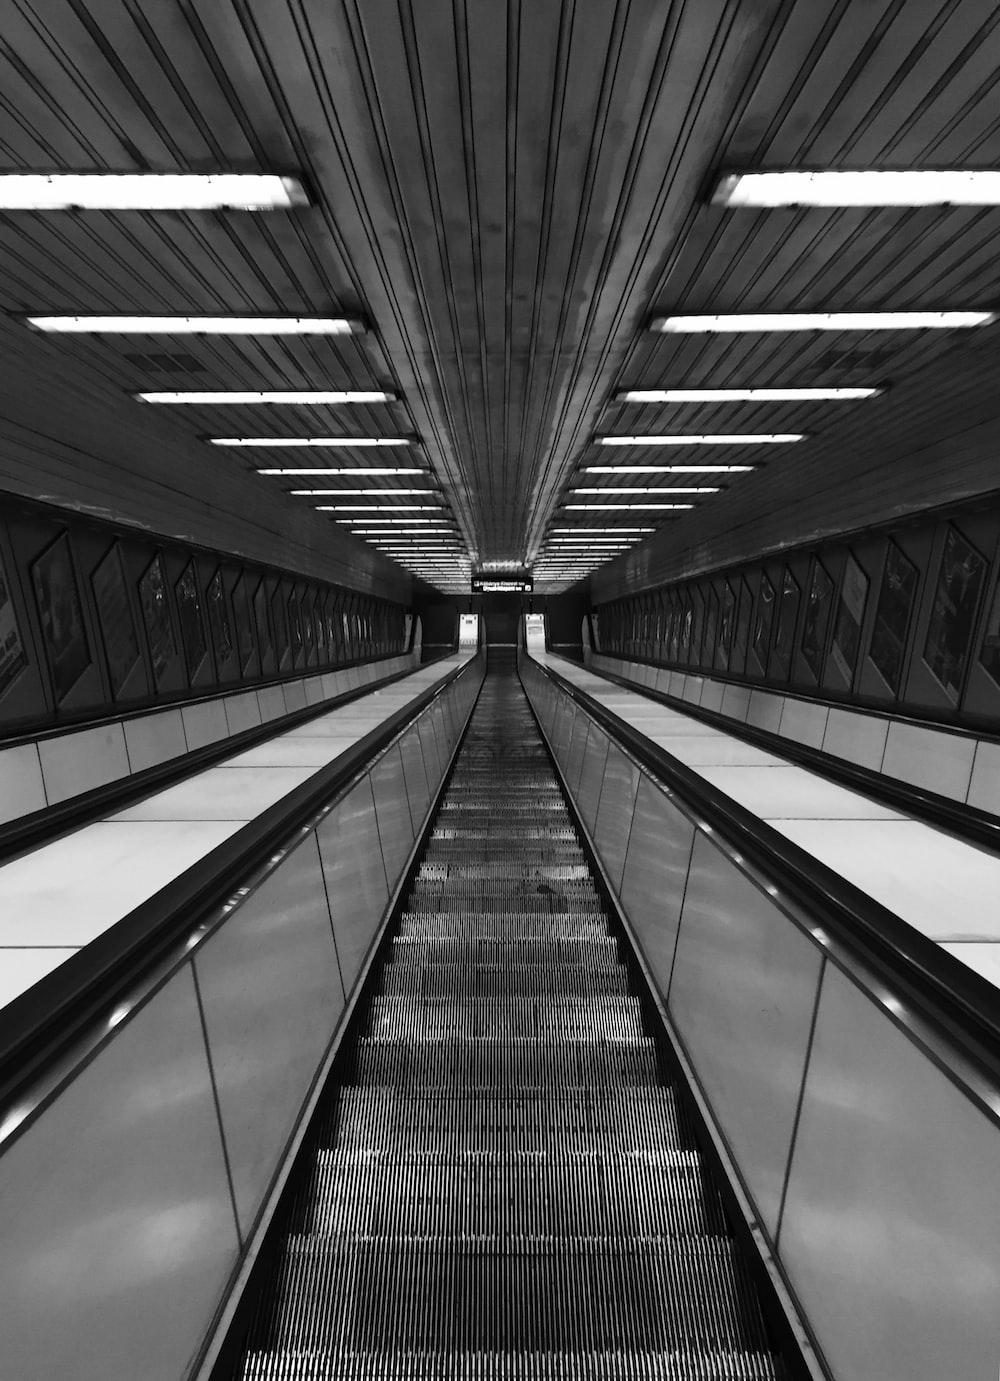 gray empty escalator